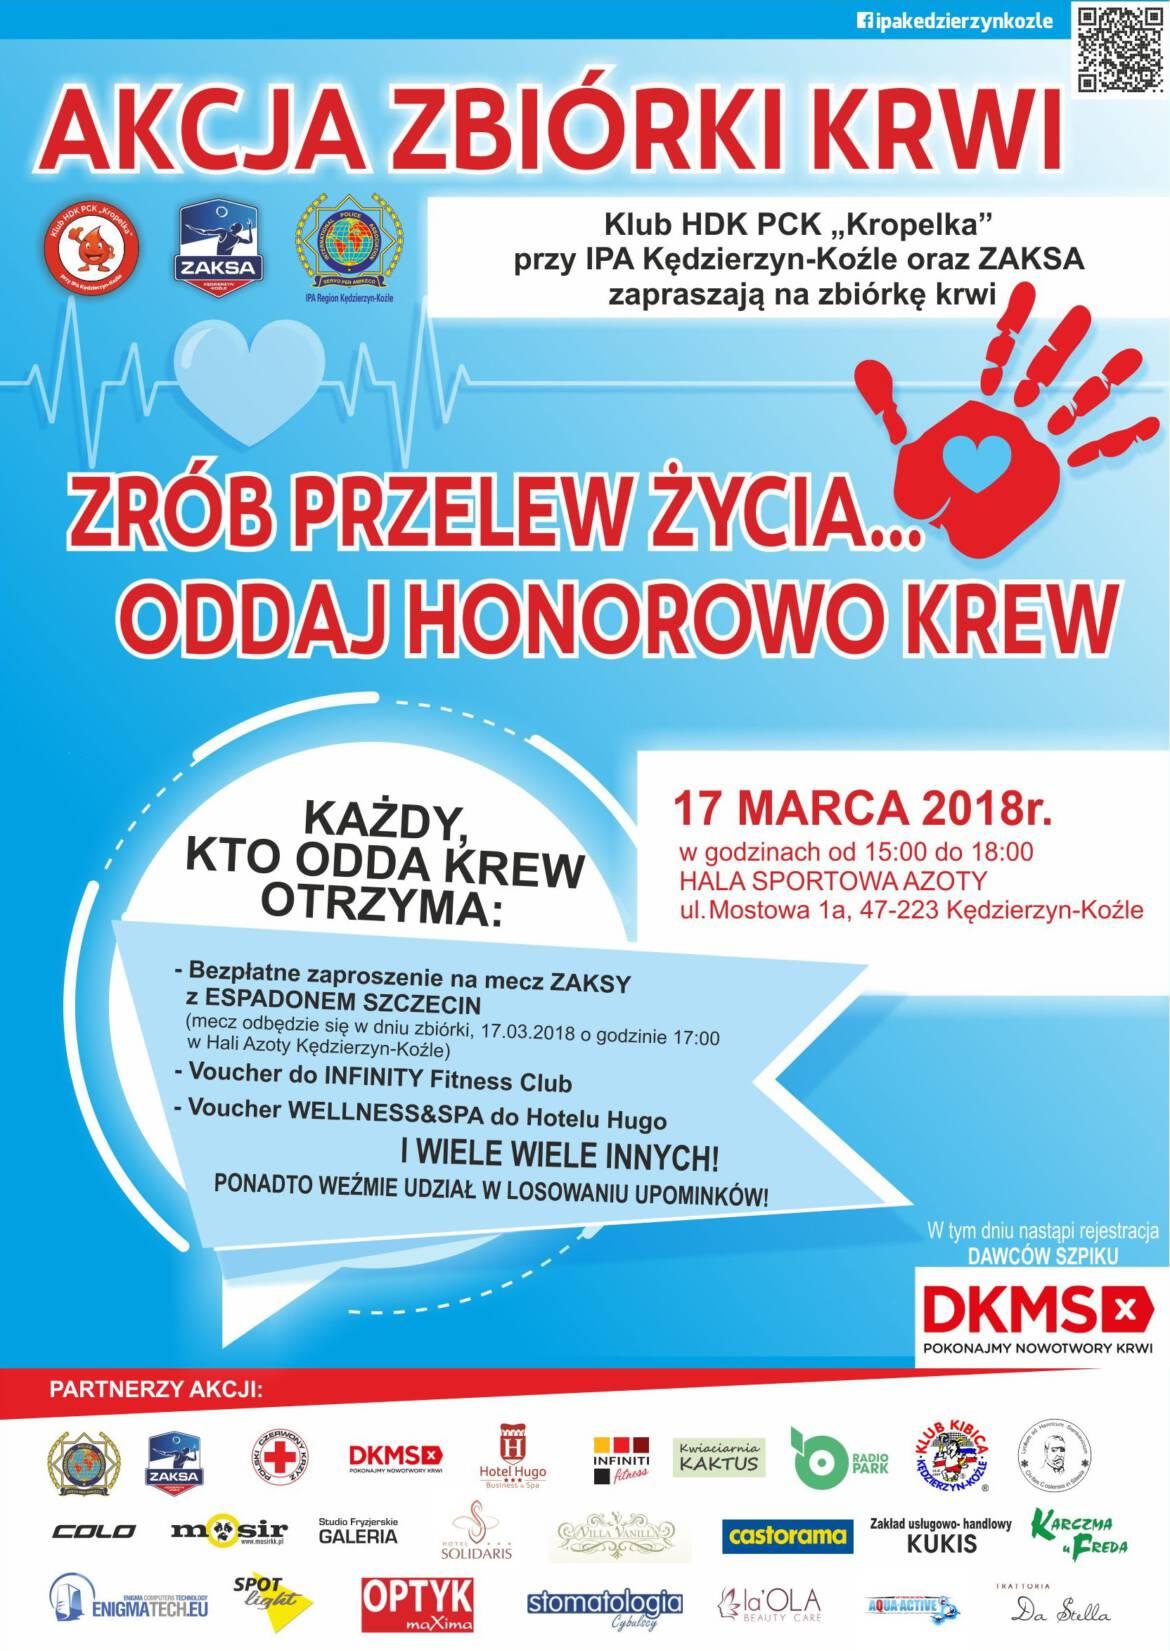 IPA-PLAKAT_ZBIÓRKA-KRWI-17.03.2018r..jpg